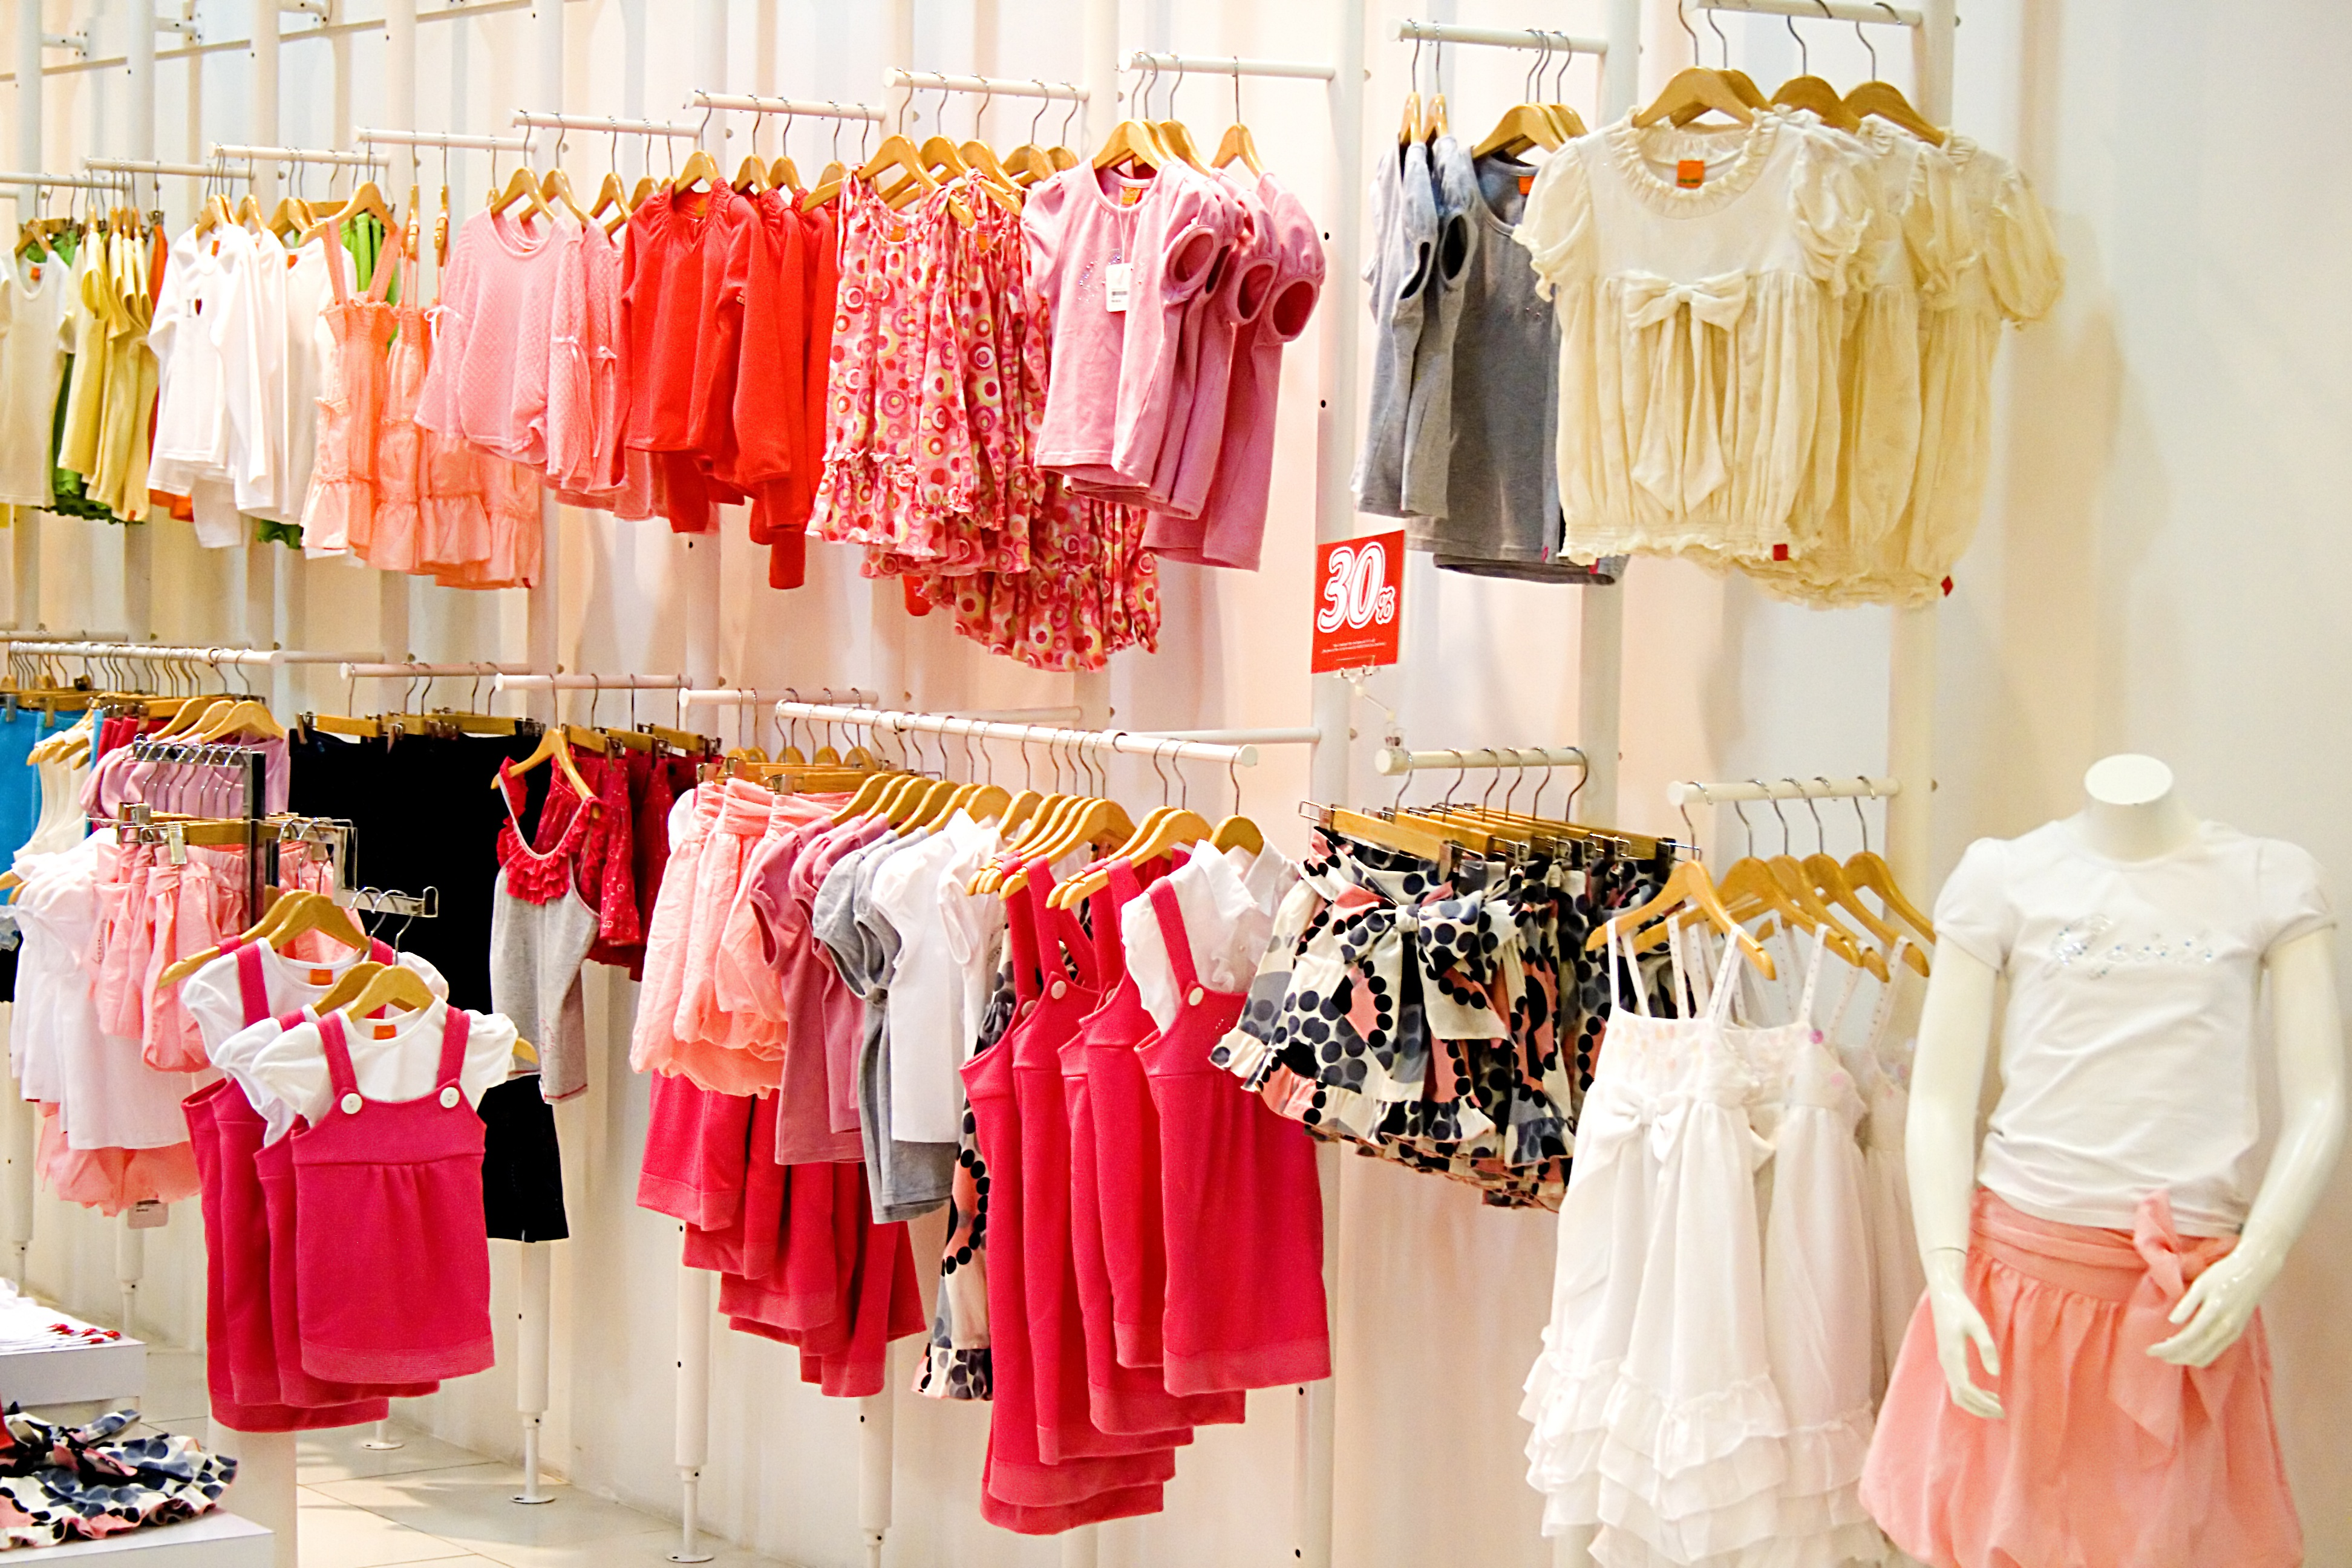 Childrens_Clothing.jpeg